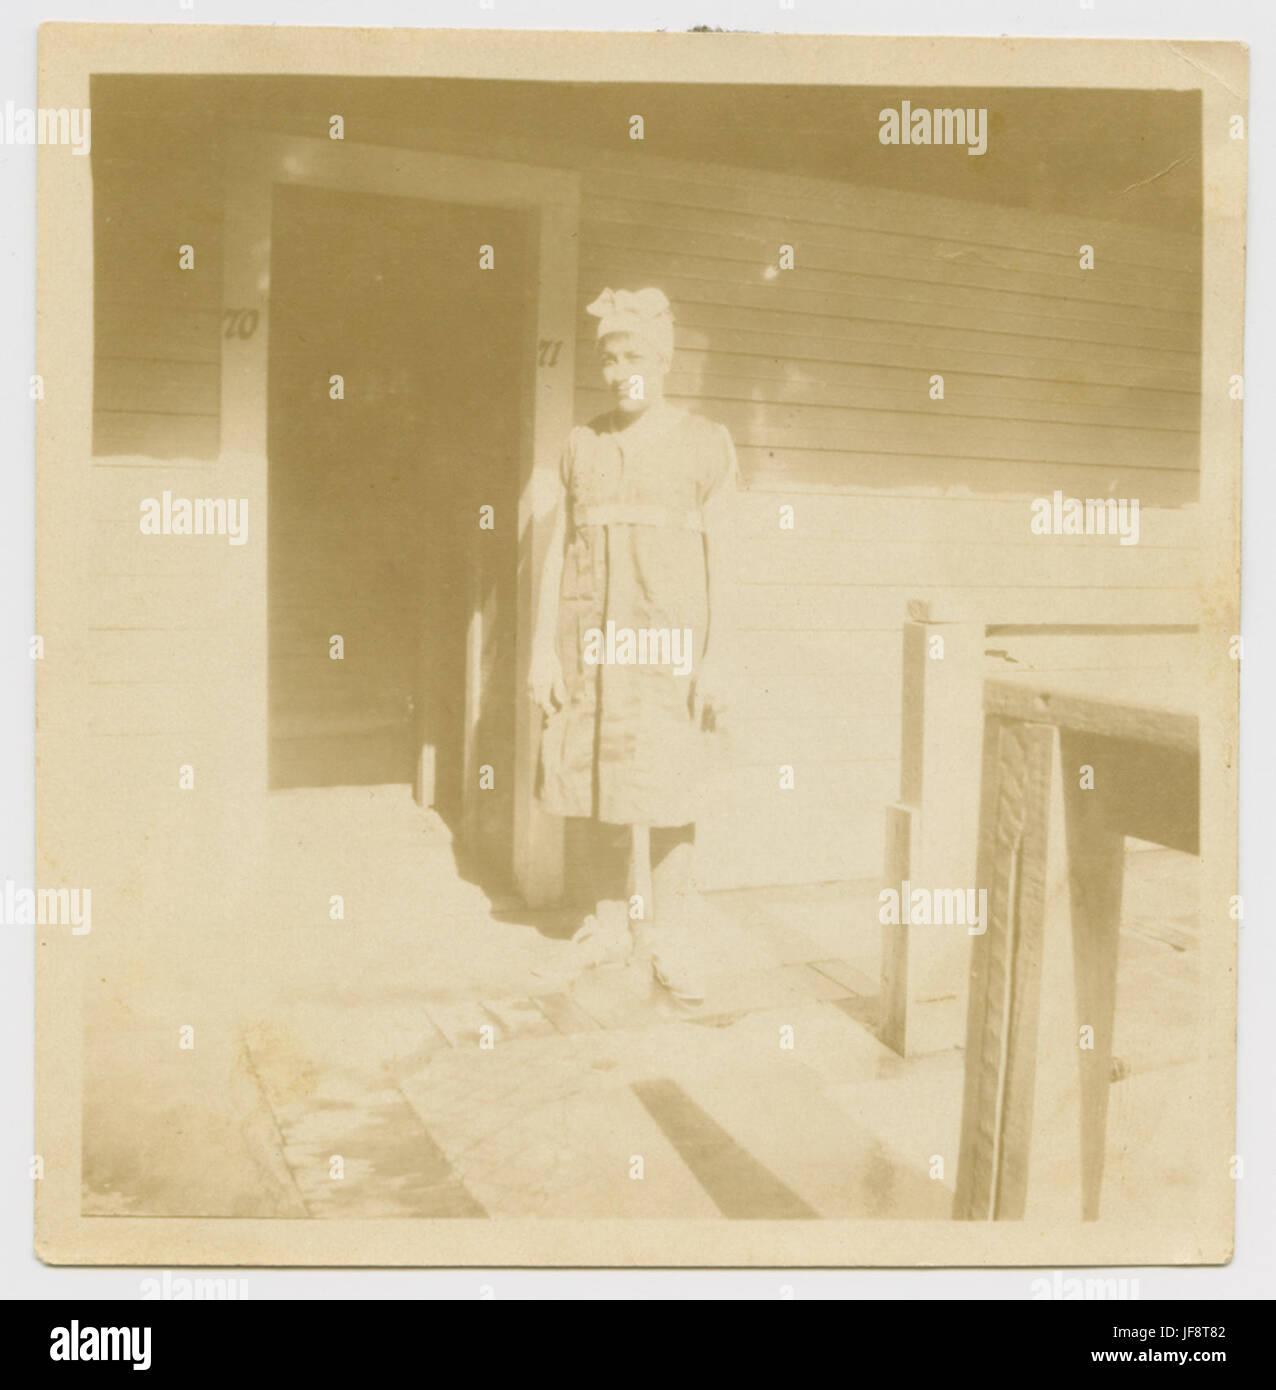 [Woman in Bathing Costume, Houston Heights Natatorium] 32460858702 o - Stock Image